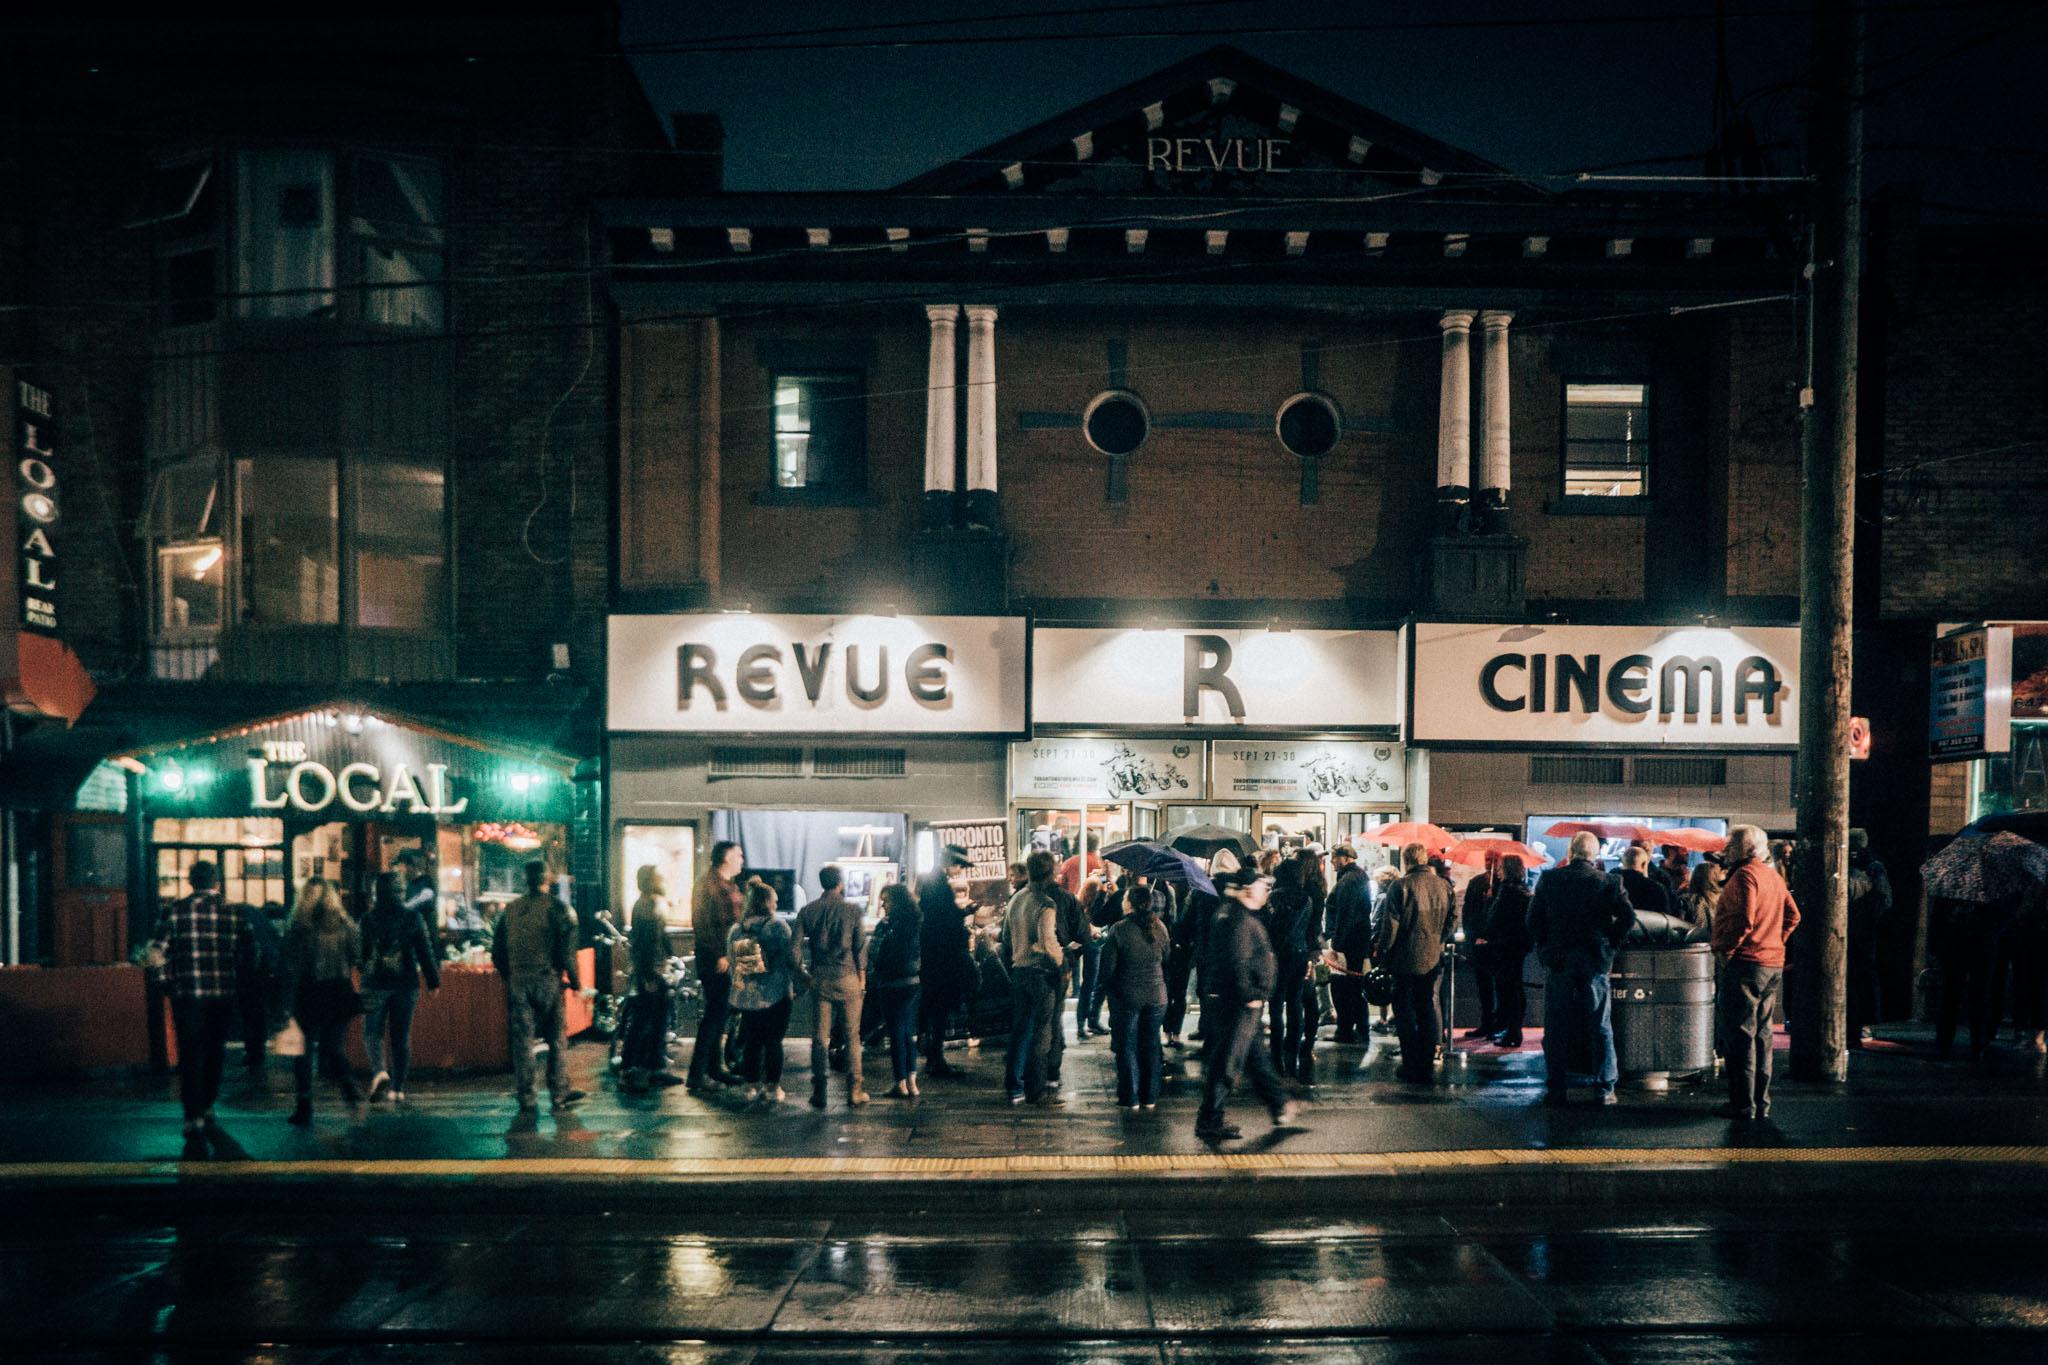 Outside the Revue Cinema